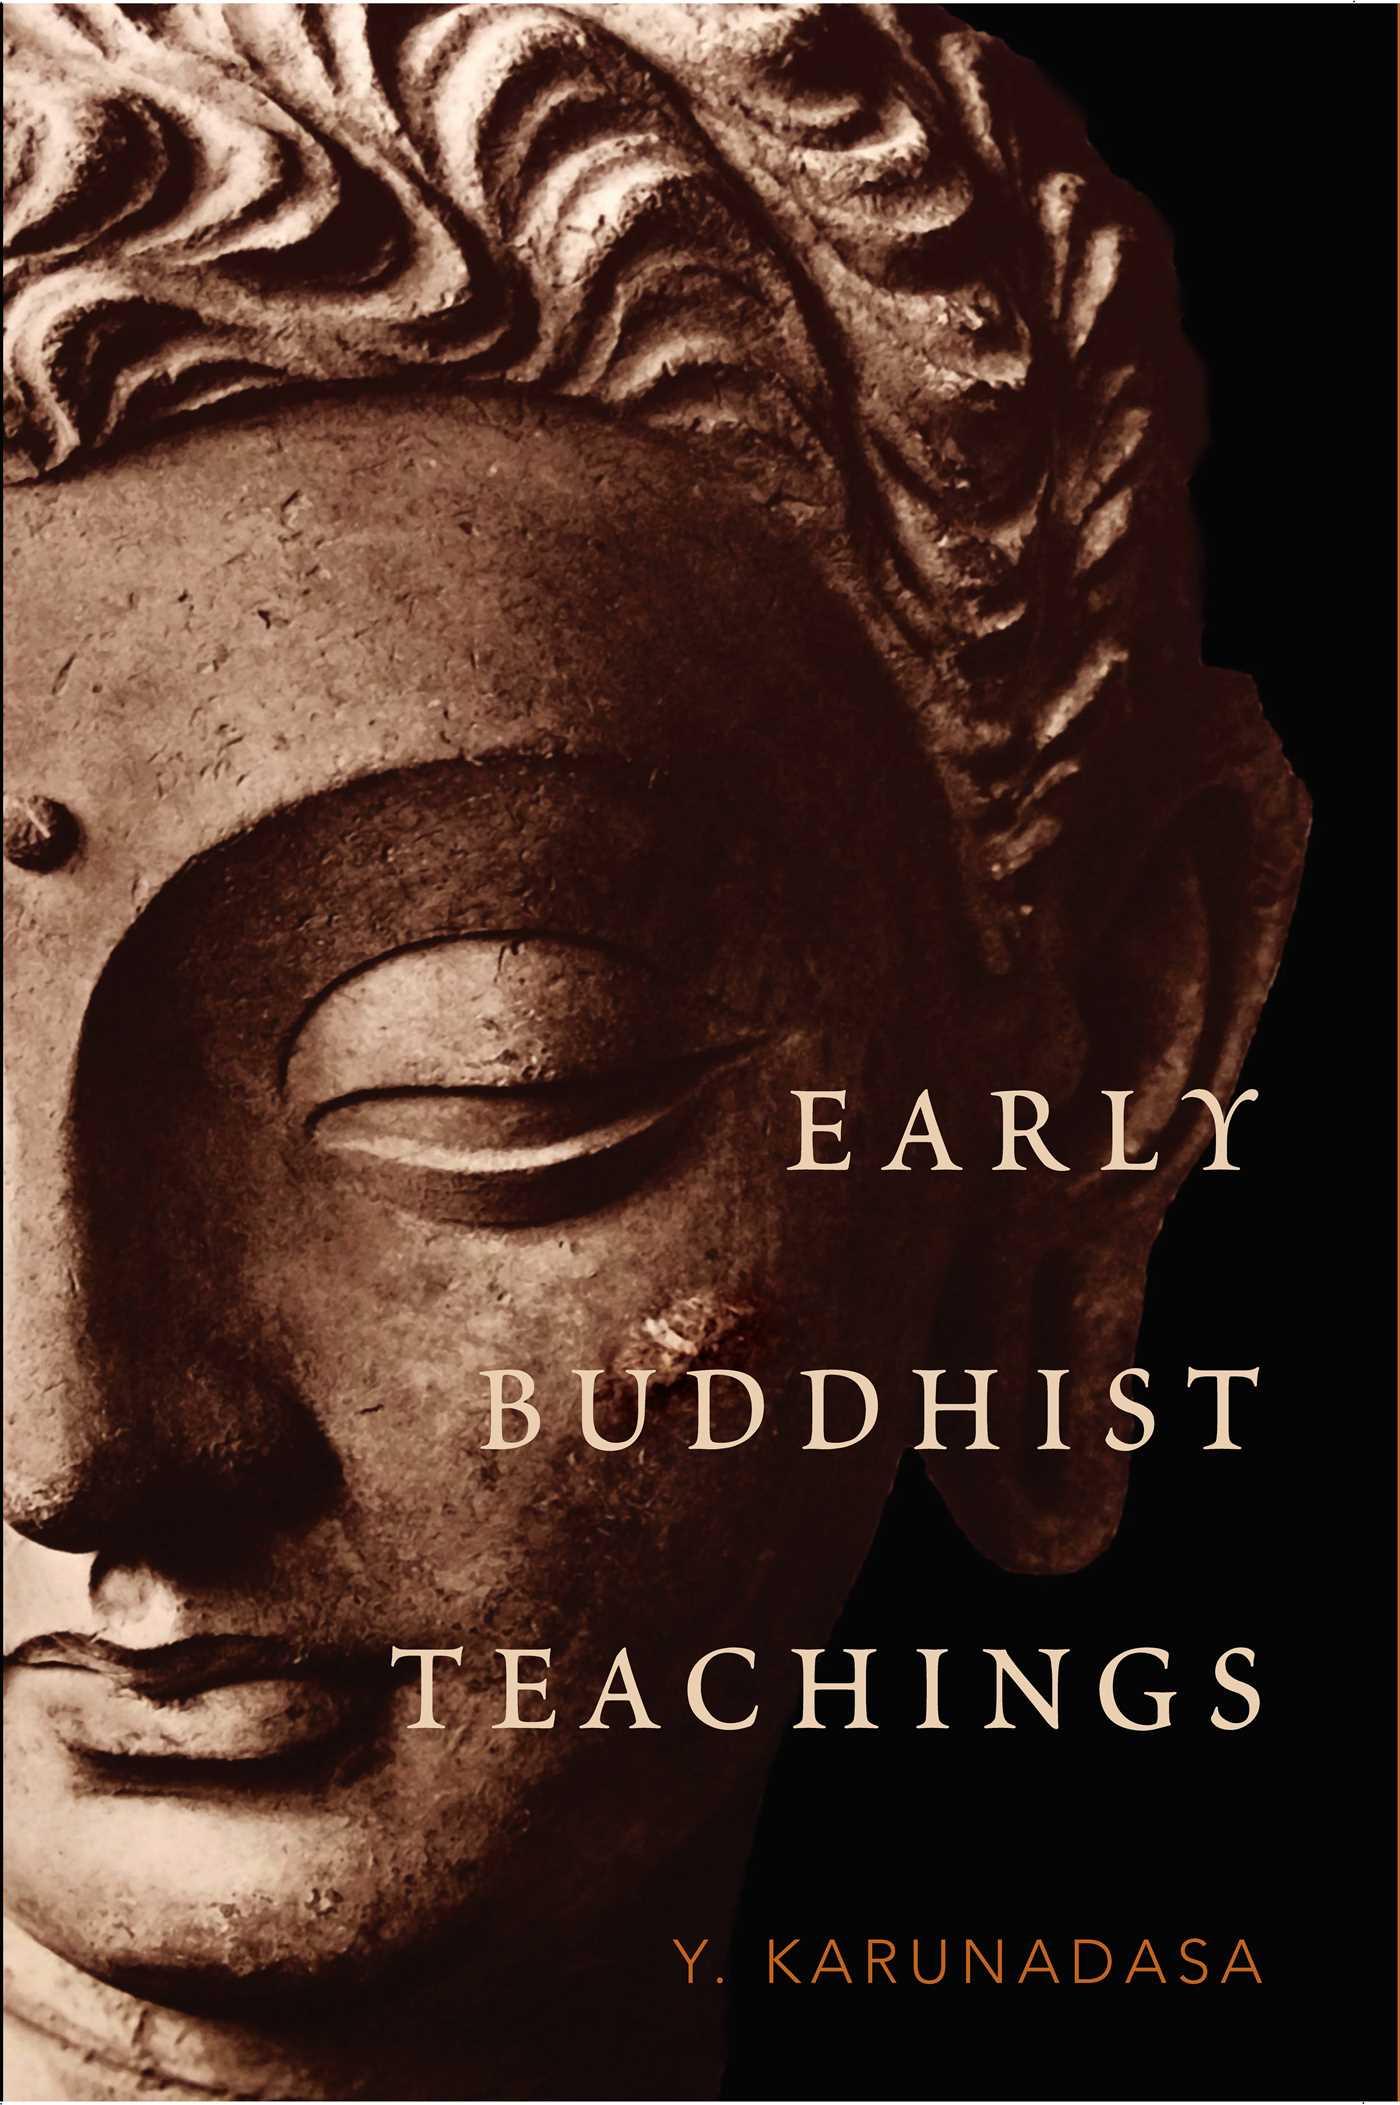 Early buddhist teachings 9781614294528 hr